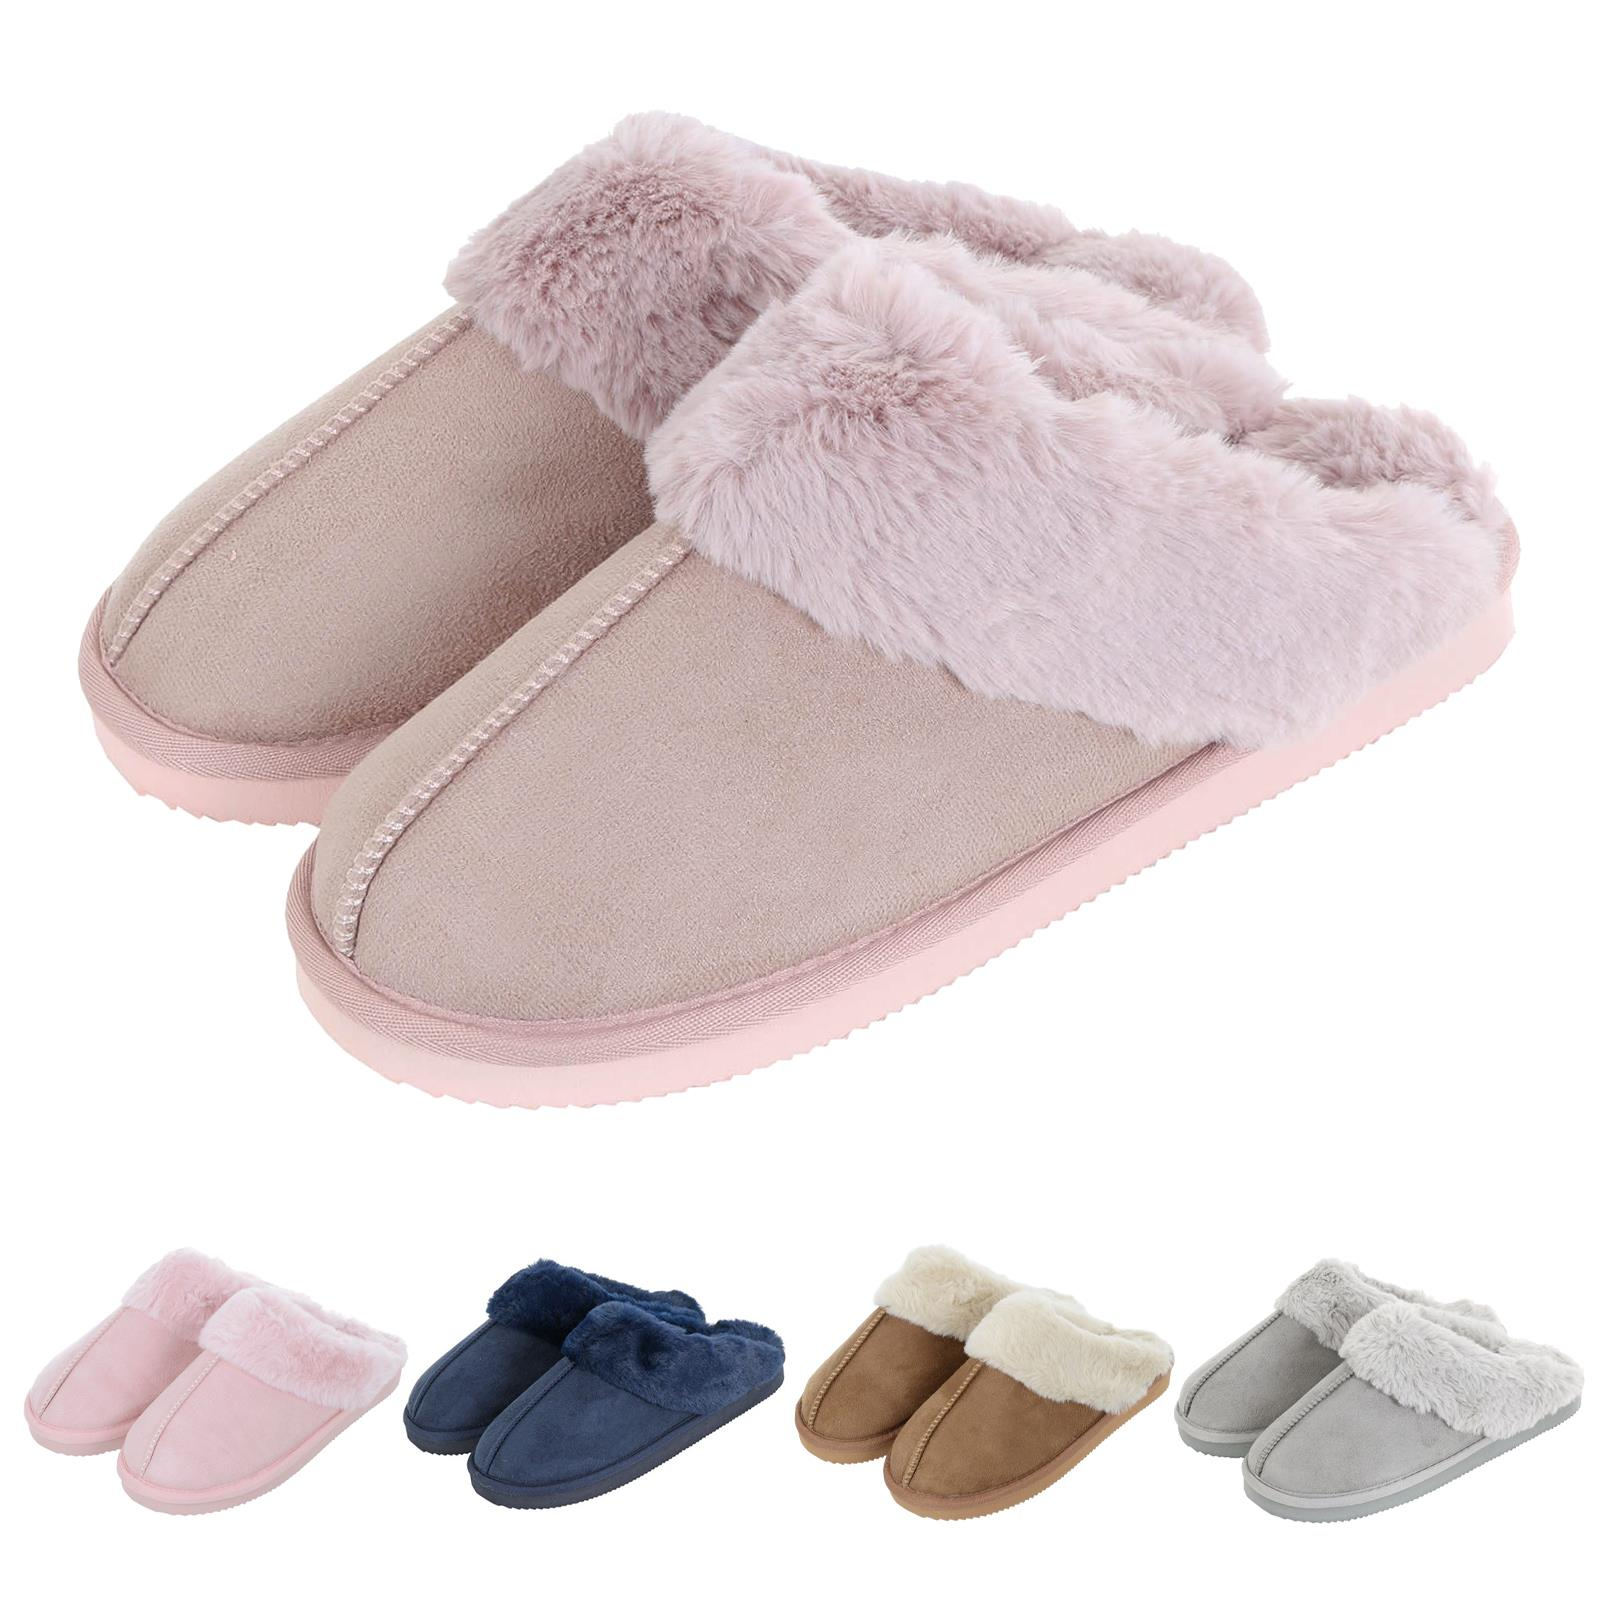 Autumn Faith Ladies Slippers Luxury Womens Microsuede Mules Fleece Lining Non-Slip Sole